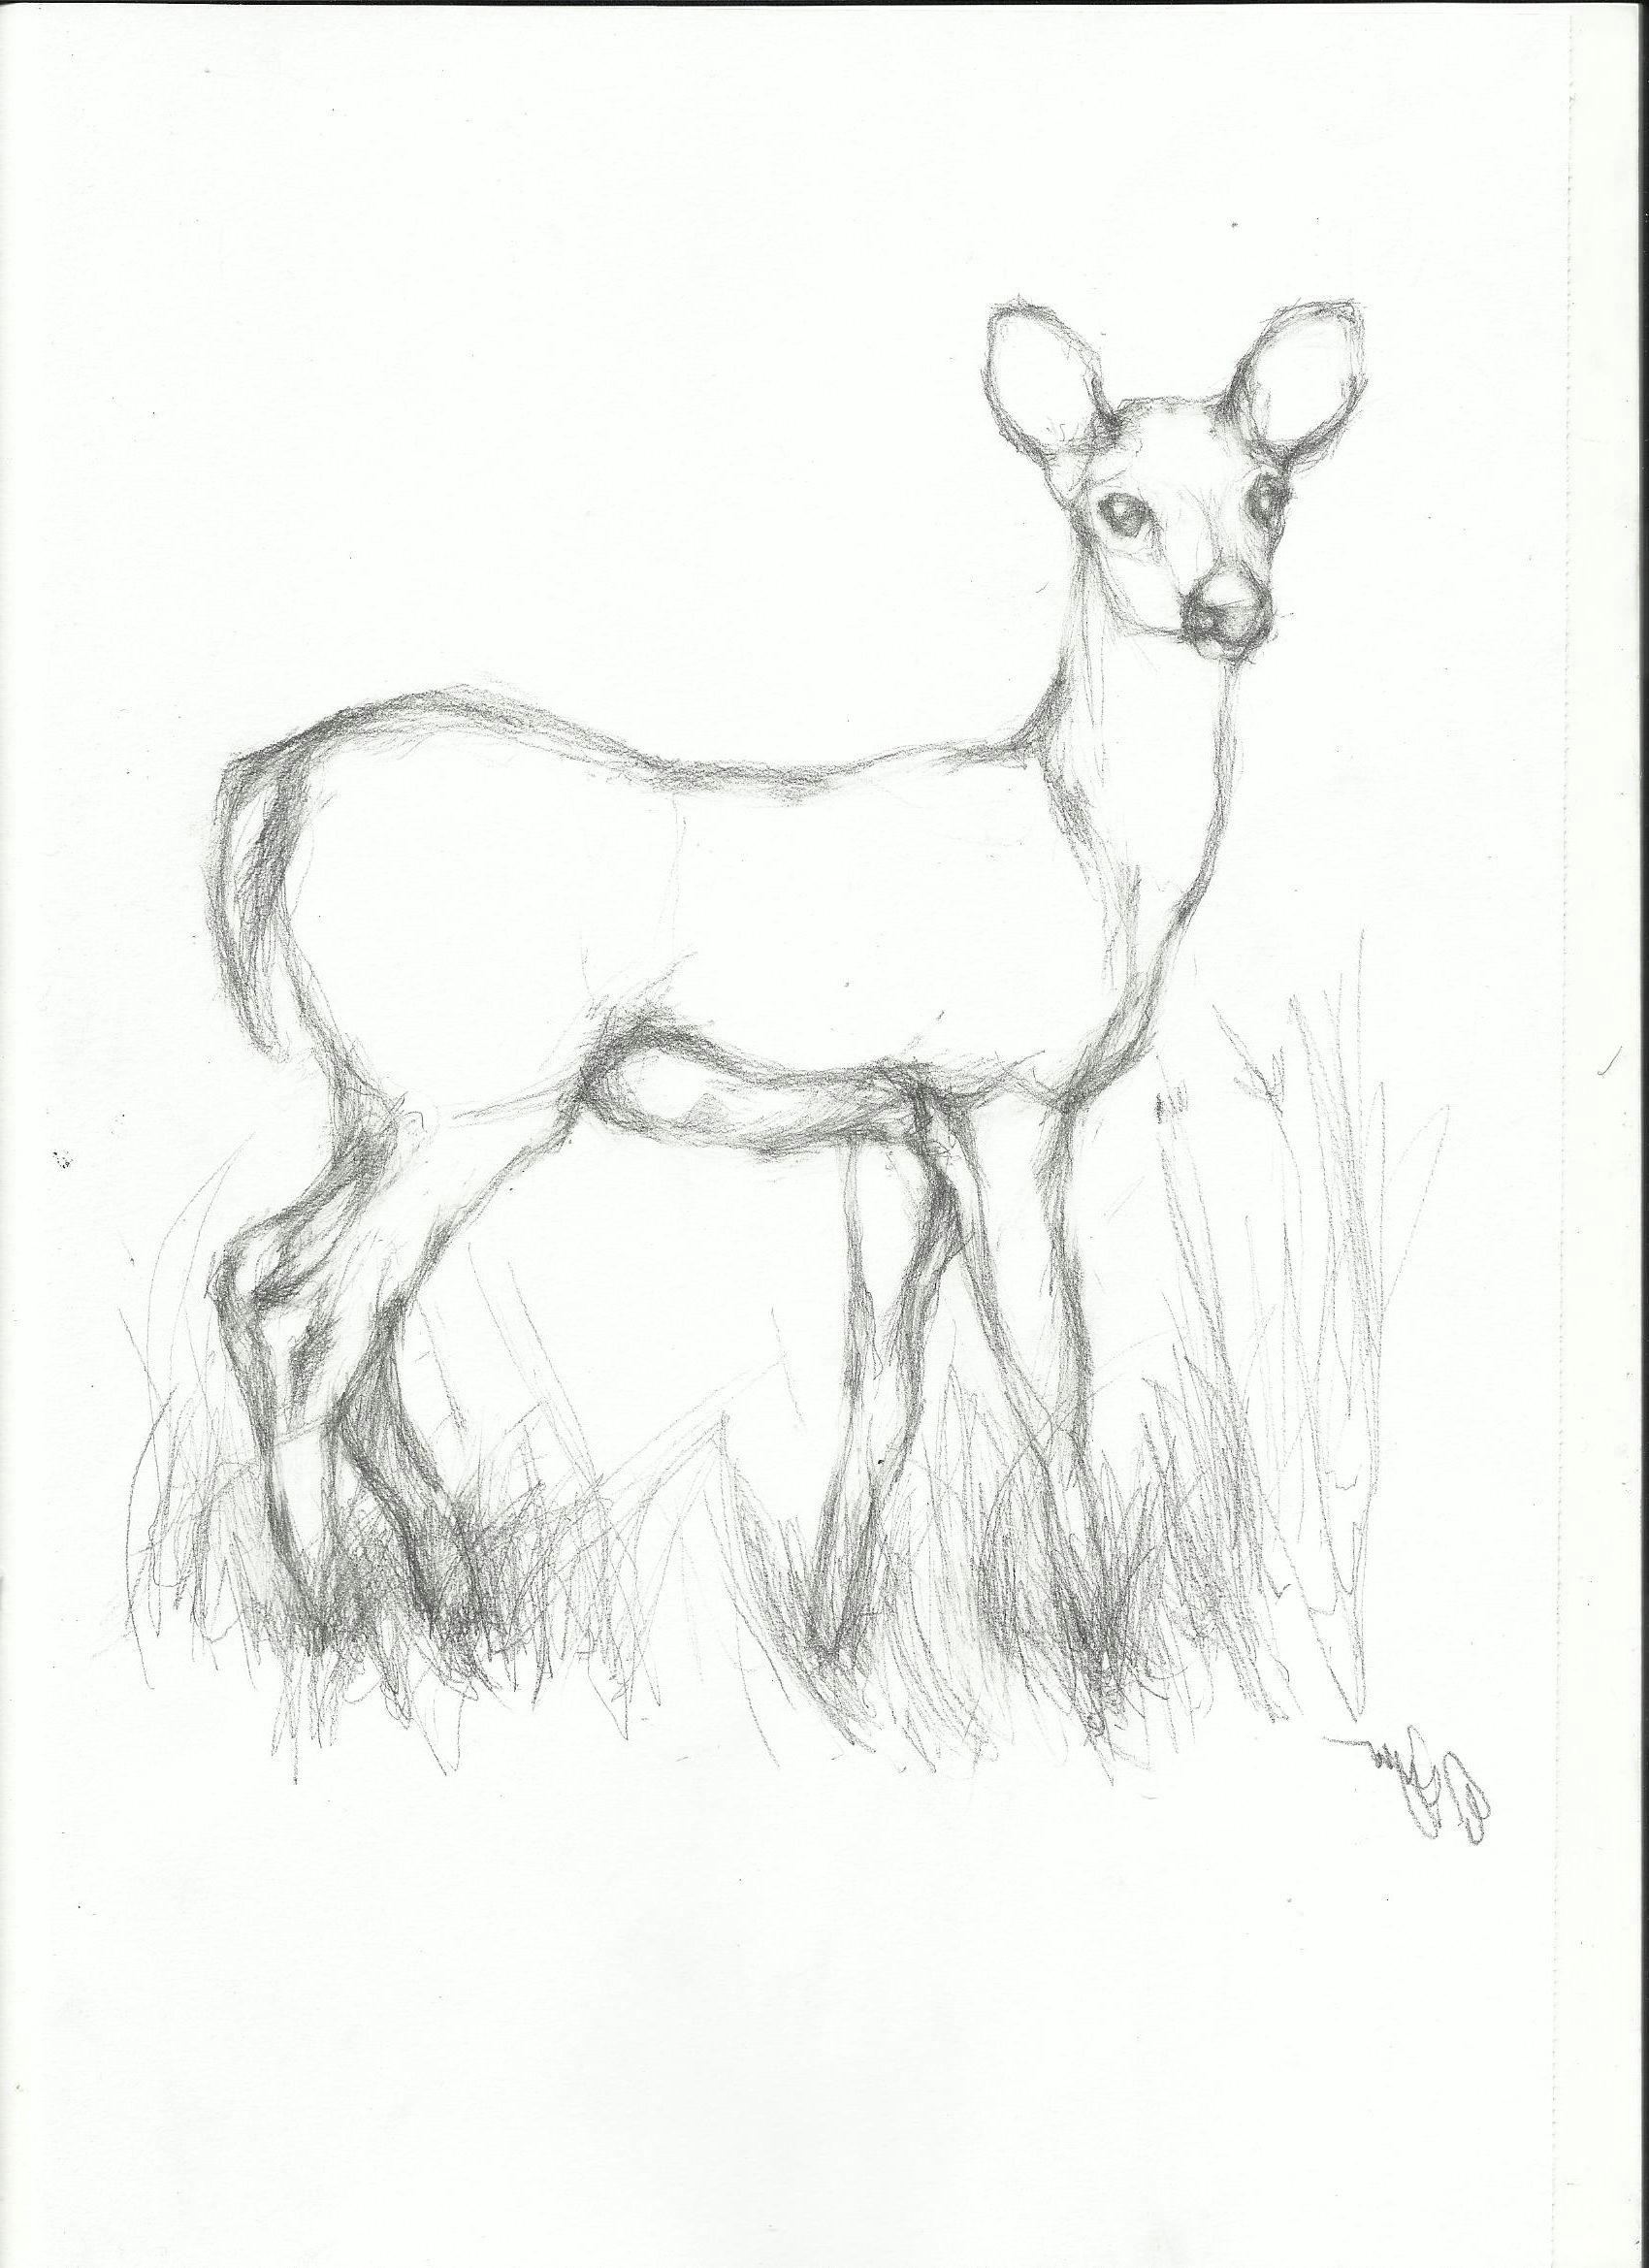 Easy Drawings Of Jason Pencil Easy Animal Sketch Drawing Drawing Drawings Pencil